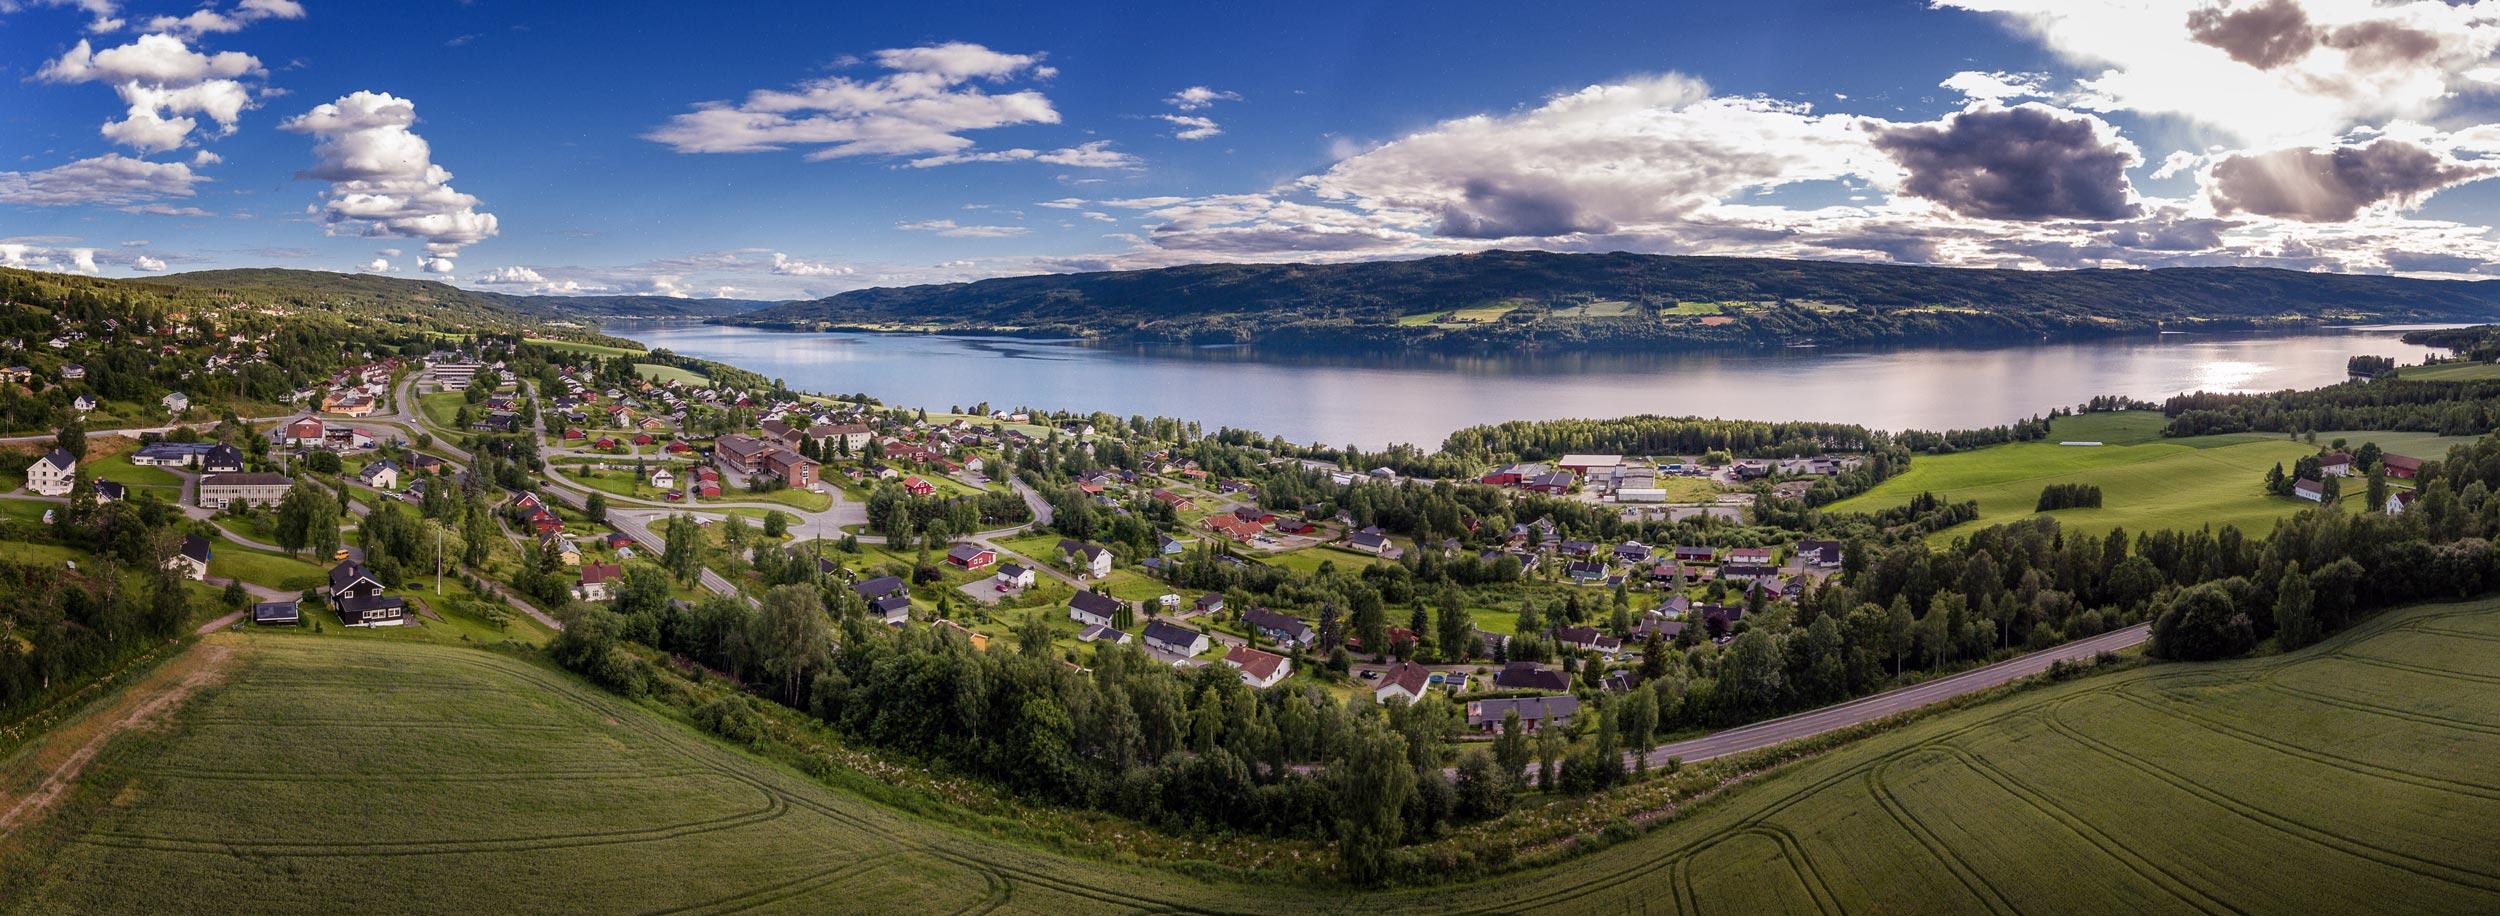 Hov i Land - Dronefoto, Søndre Land